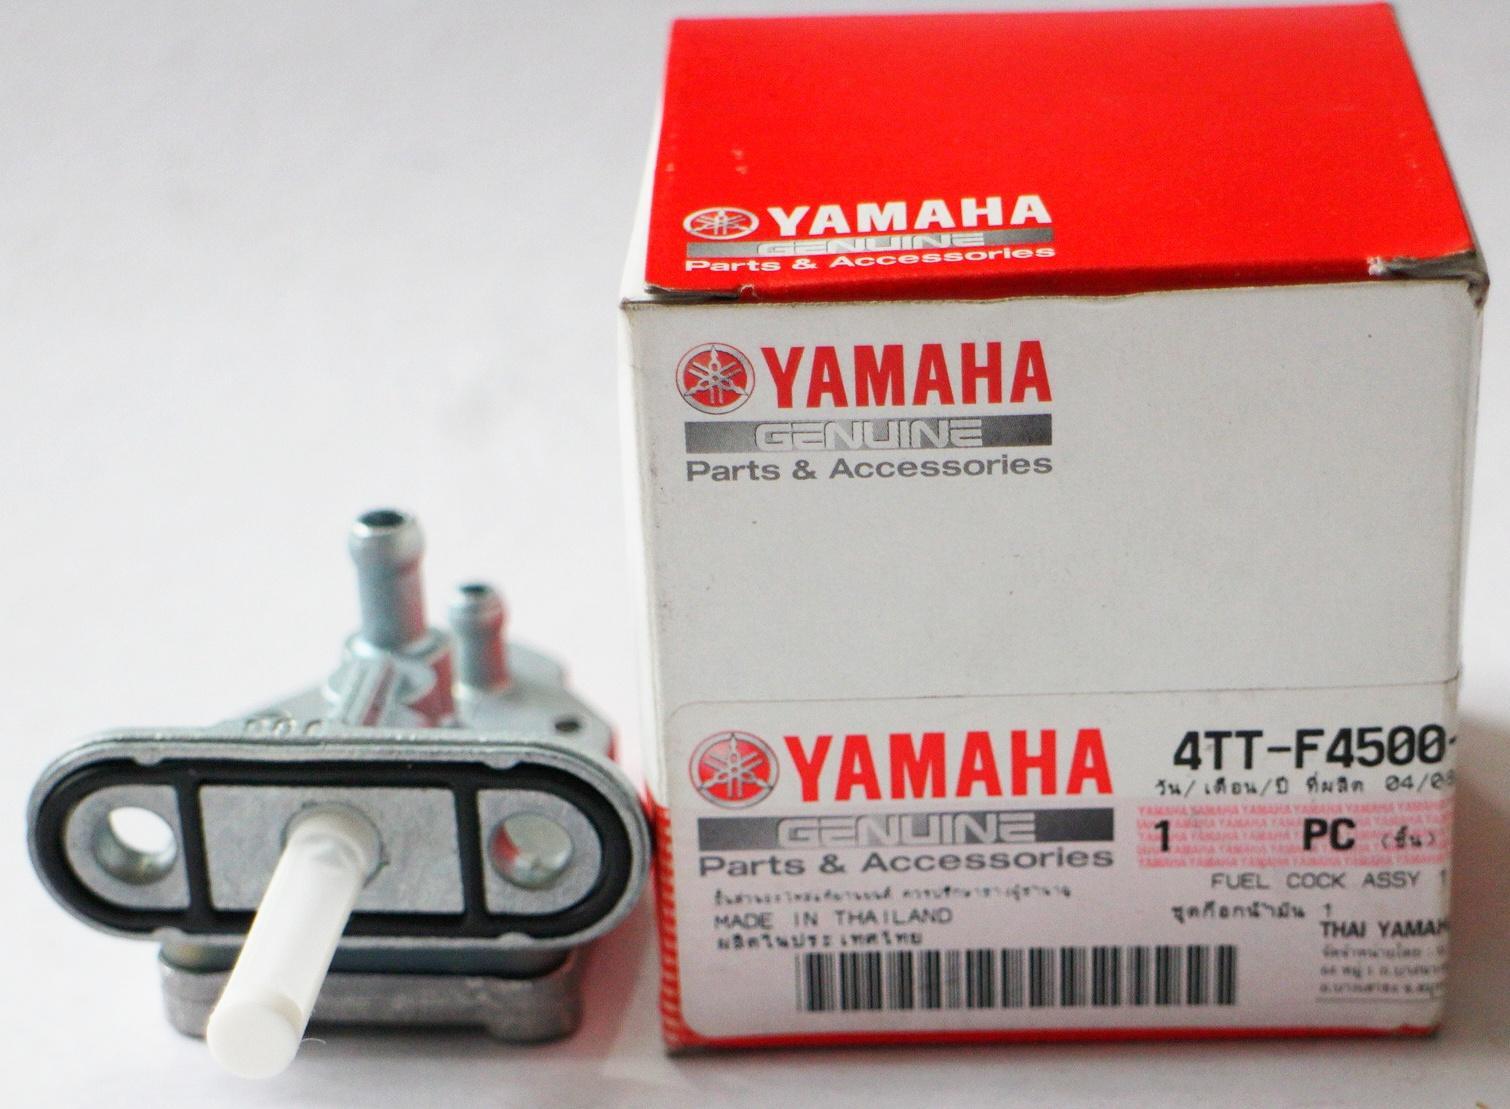 Original Yamaha Fuel Cock For Mio Sporty, Soul By Jca Motorshop.